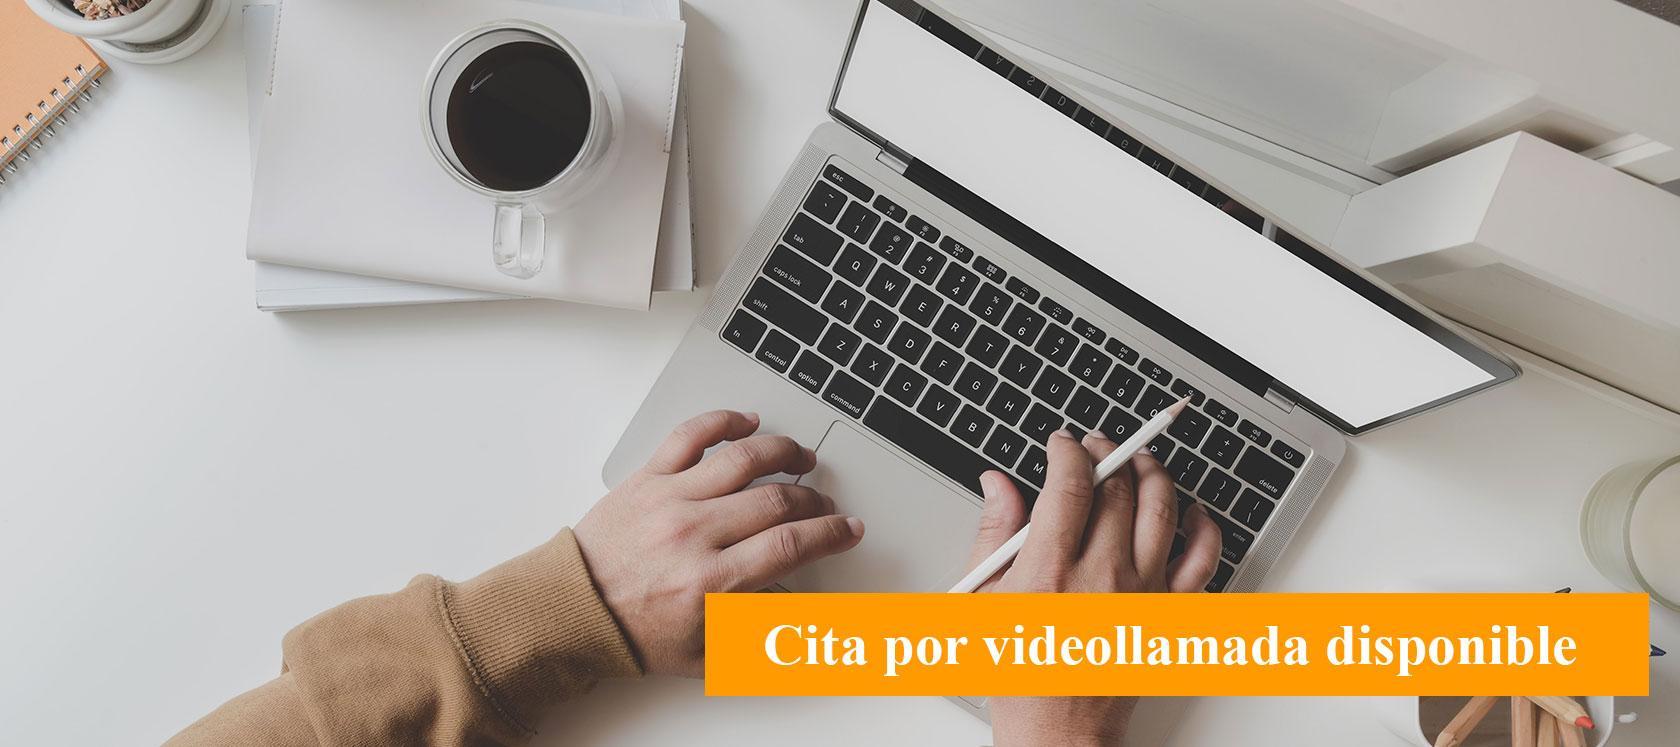 Obra Nueva Valencia celere nicet patraix